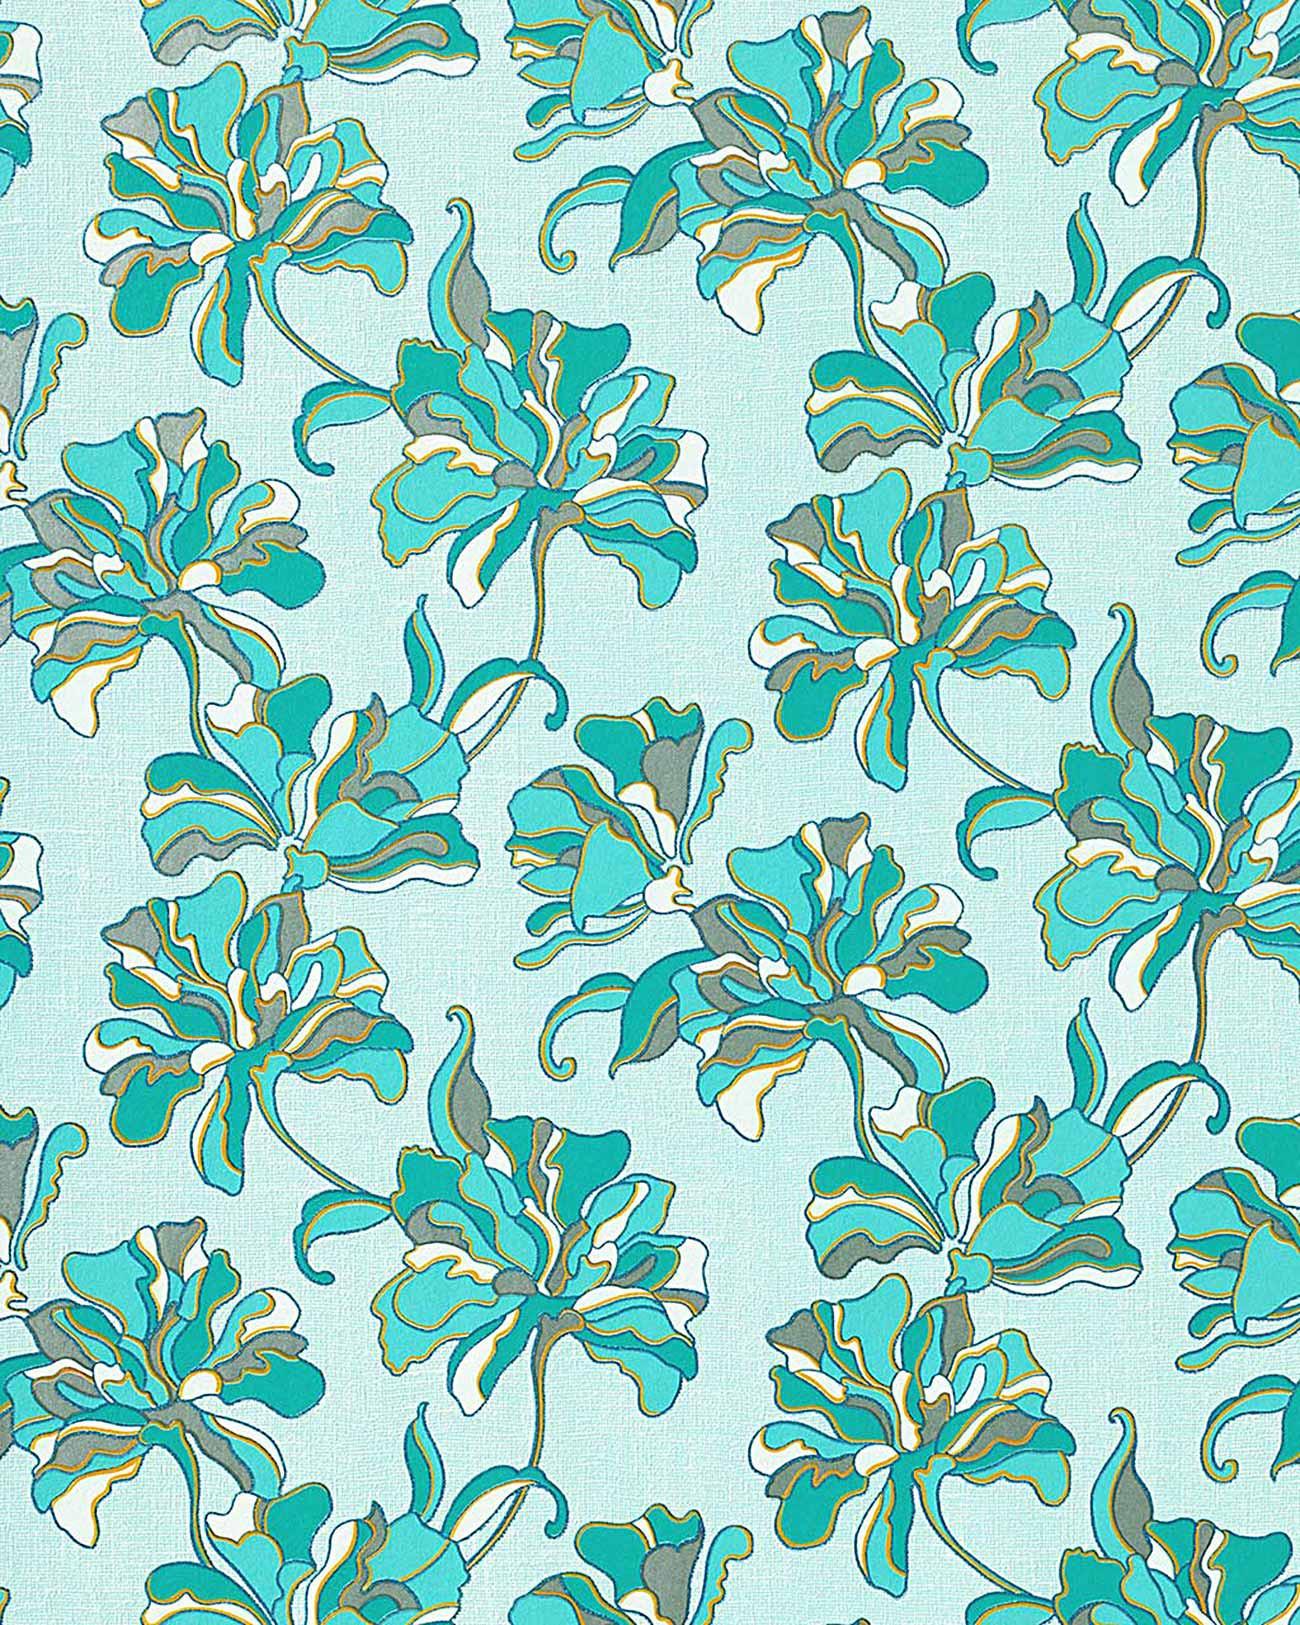 Edem 072 22 wallpaper floral design flowers turquoise blue sqm ebay - Turquoise wallpaper for walls ...